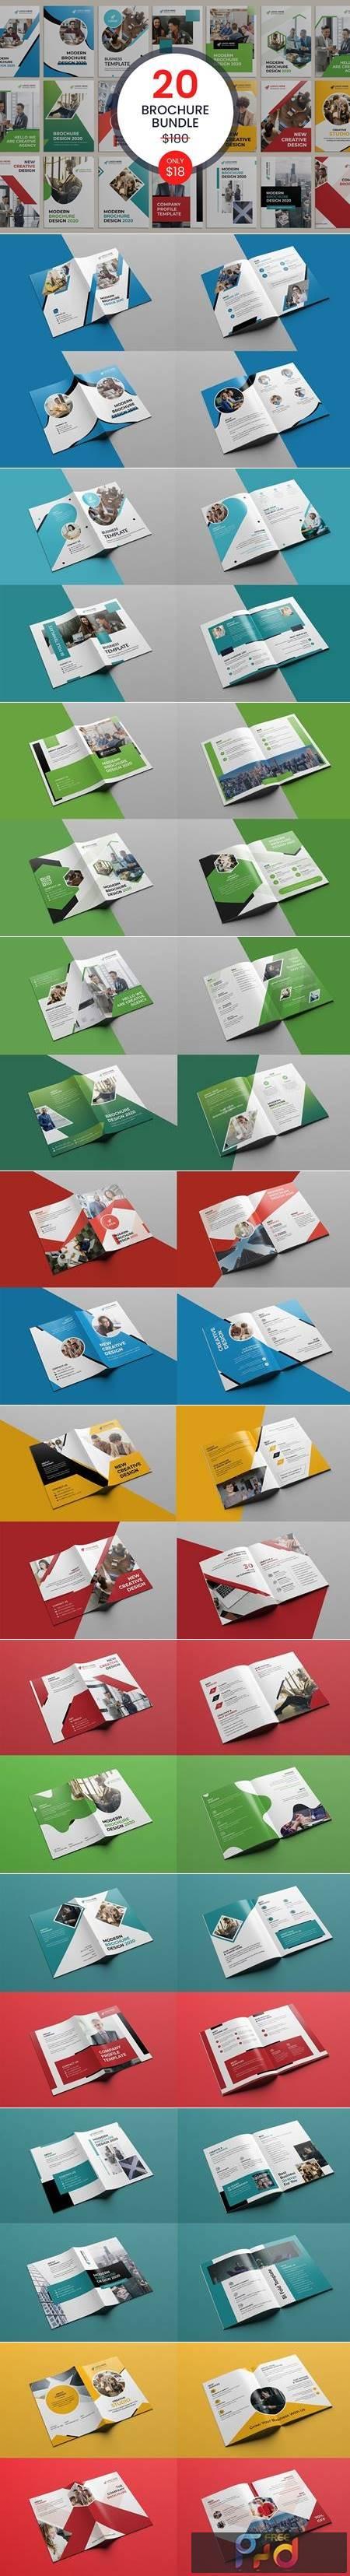 20 Bi-fold Brochure Template Bundle 5487372 1